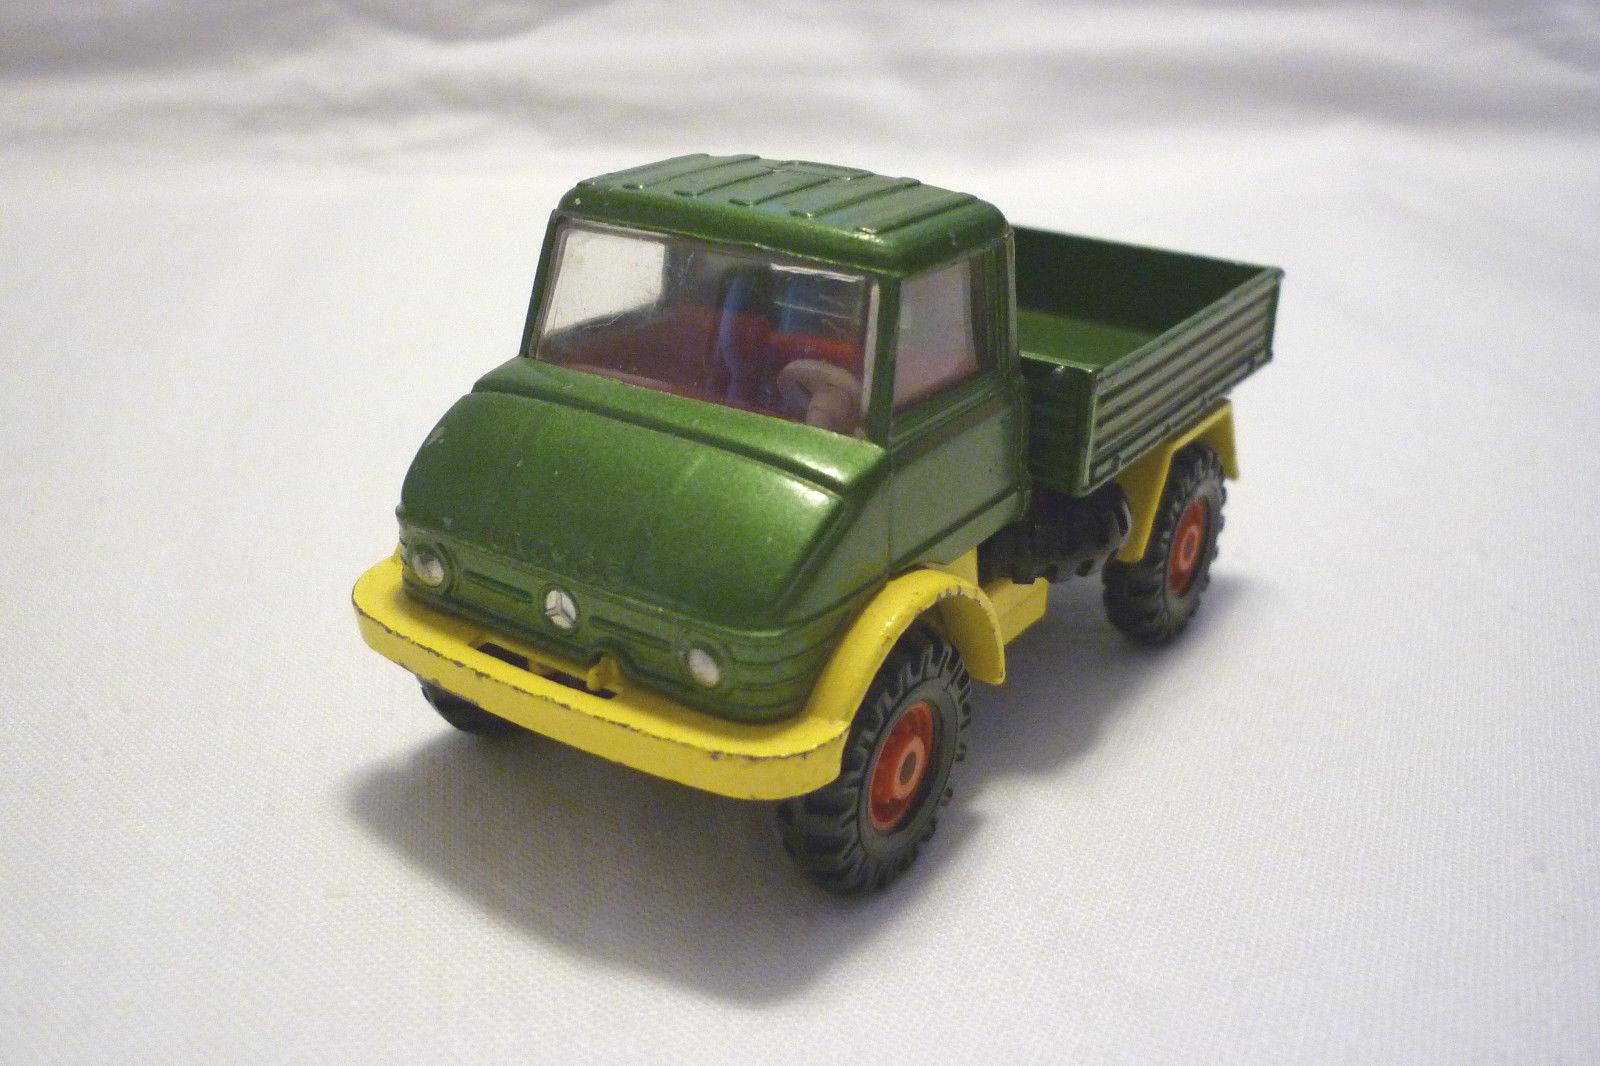 Corgi - Vintage Metal Model - Mercedes Unimog 406 - (Corgi 103)